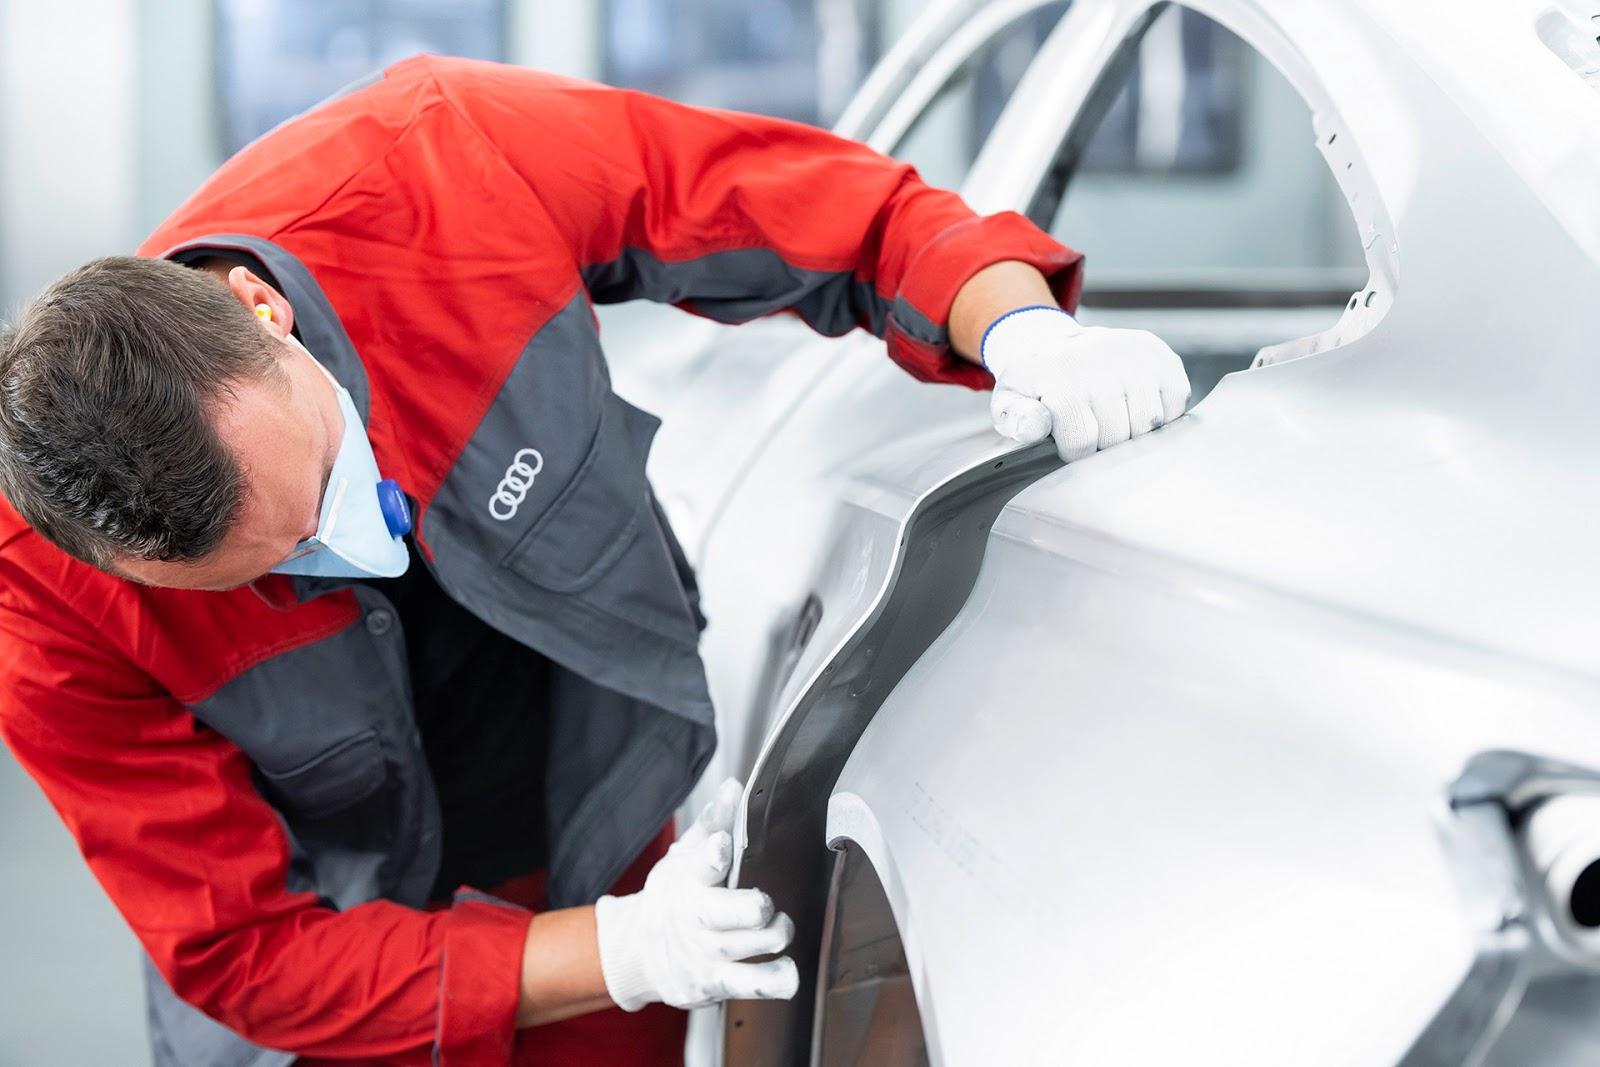 AUDI2B 2B25CE259525CE259D25CE259125CE25A125CE259E25CE25972B25CE25A025CE259125CE25A125CE259125CE259325CE25A925CE259325CE259725CE25A32B25CE25A425CE259F25CE25A52BE TRON2BGT 8 Audi : Ξεκινάει η παραγωγή του e-tron GT Audi, Audi E-tron, E-tron, E-Tron GT, Electric cars, electric vehicles, EV, ειδήσεις, ηλεκτρικά, ηλεκτροκινηση